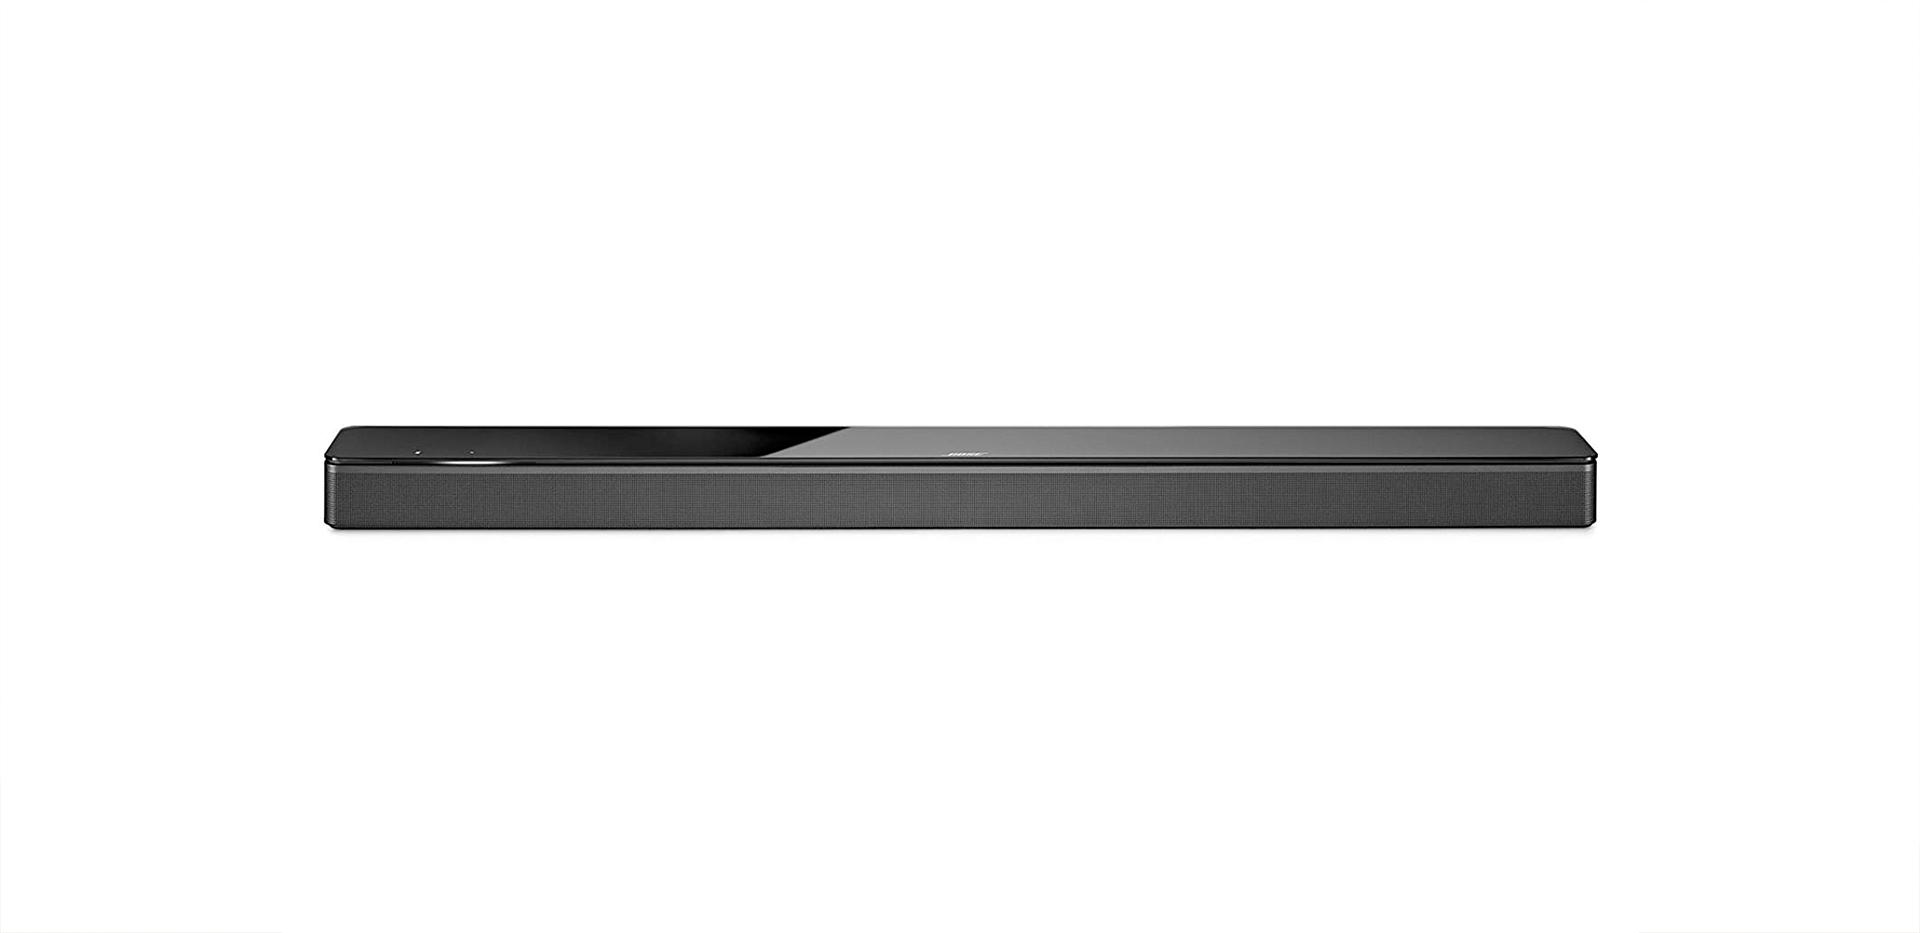 The Bose 700 soundbar.